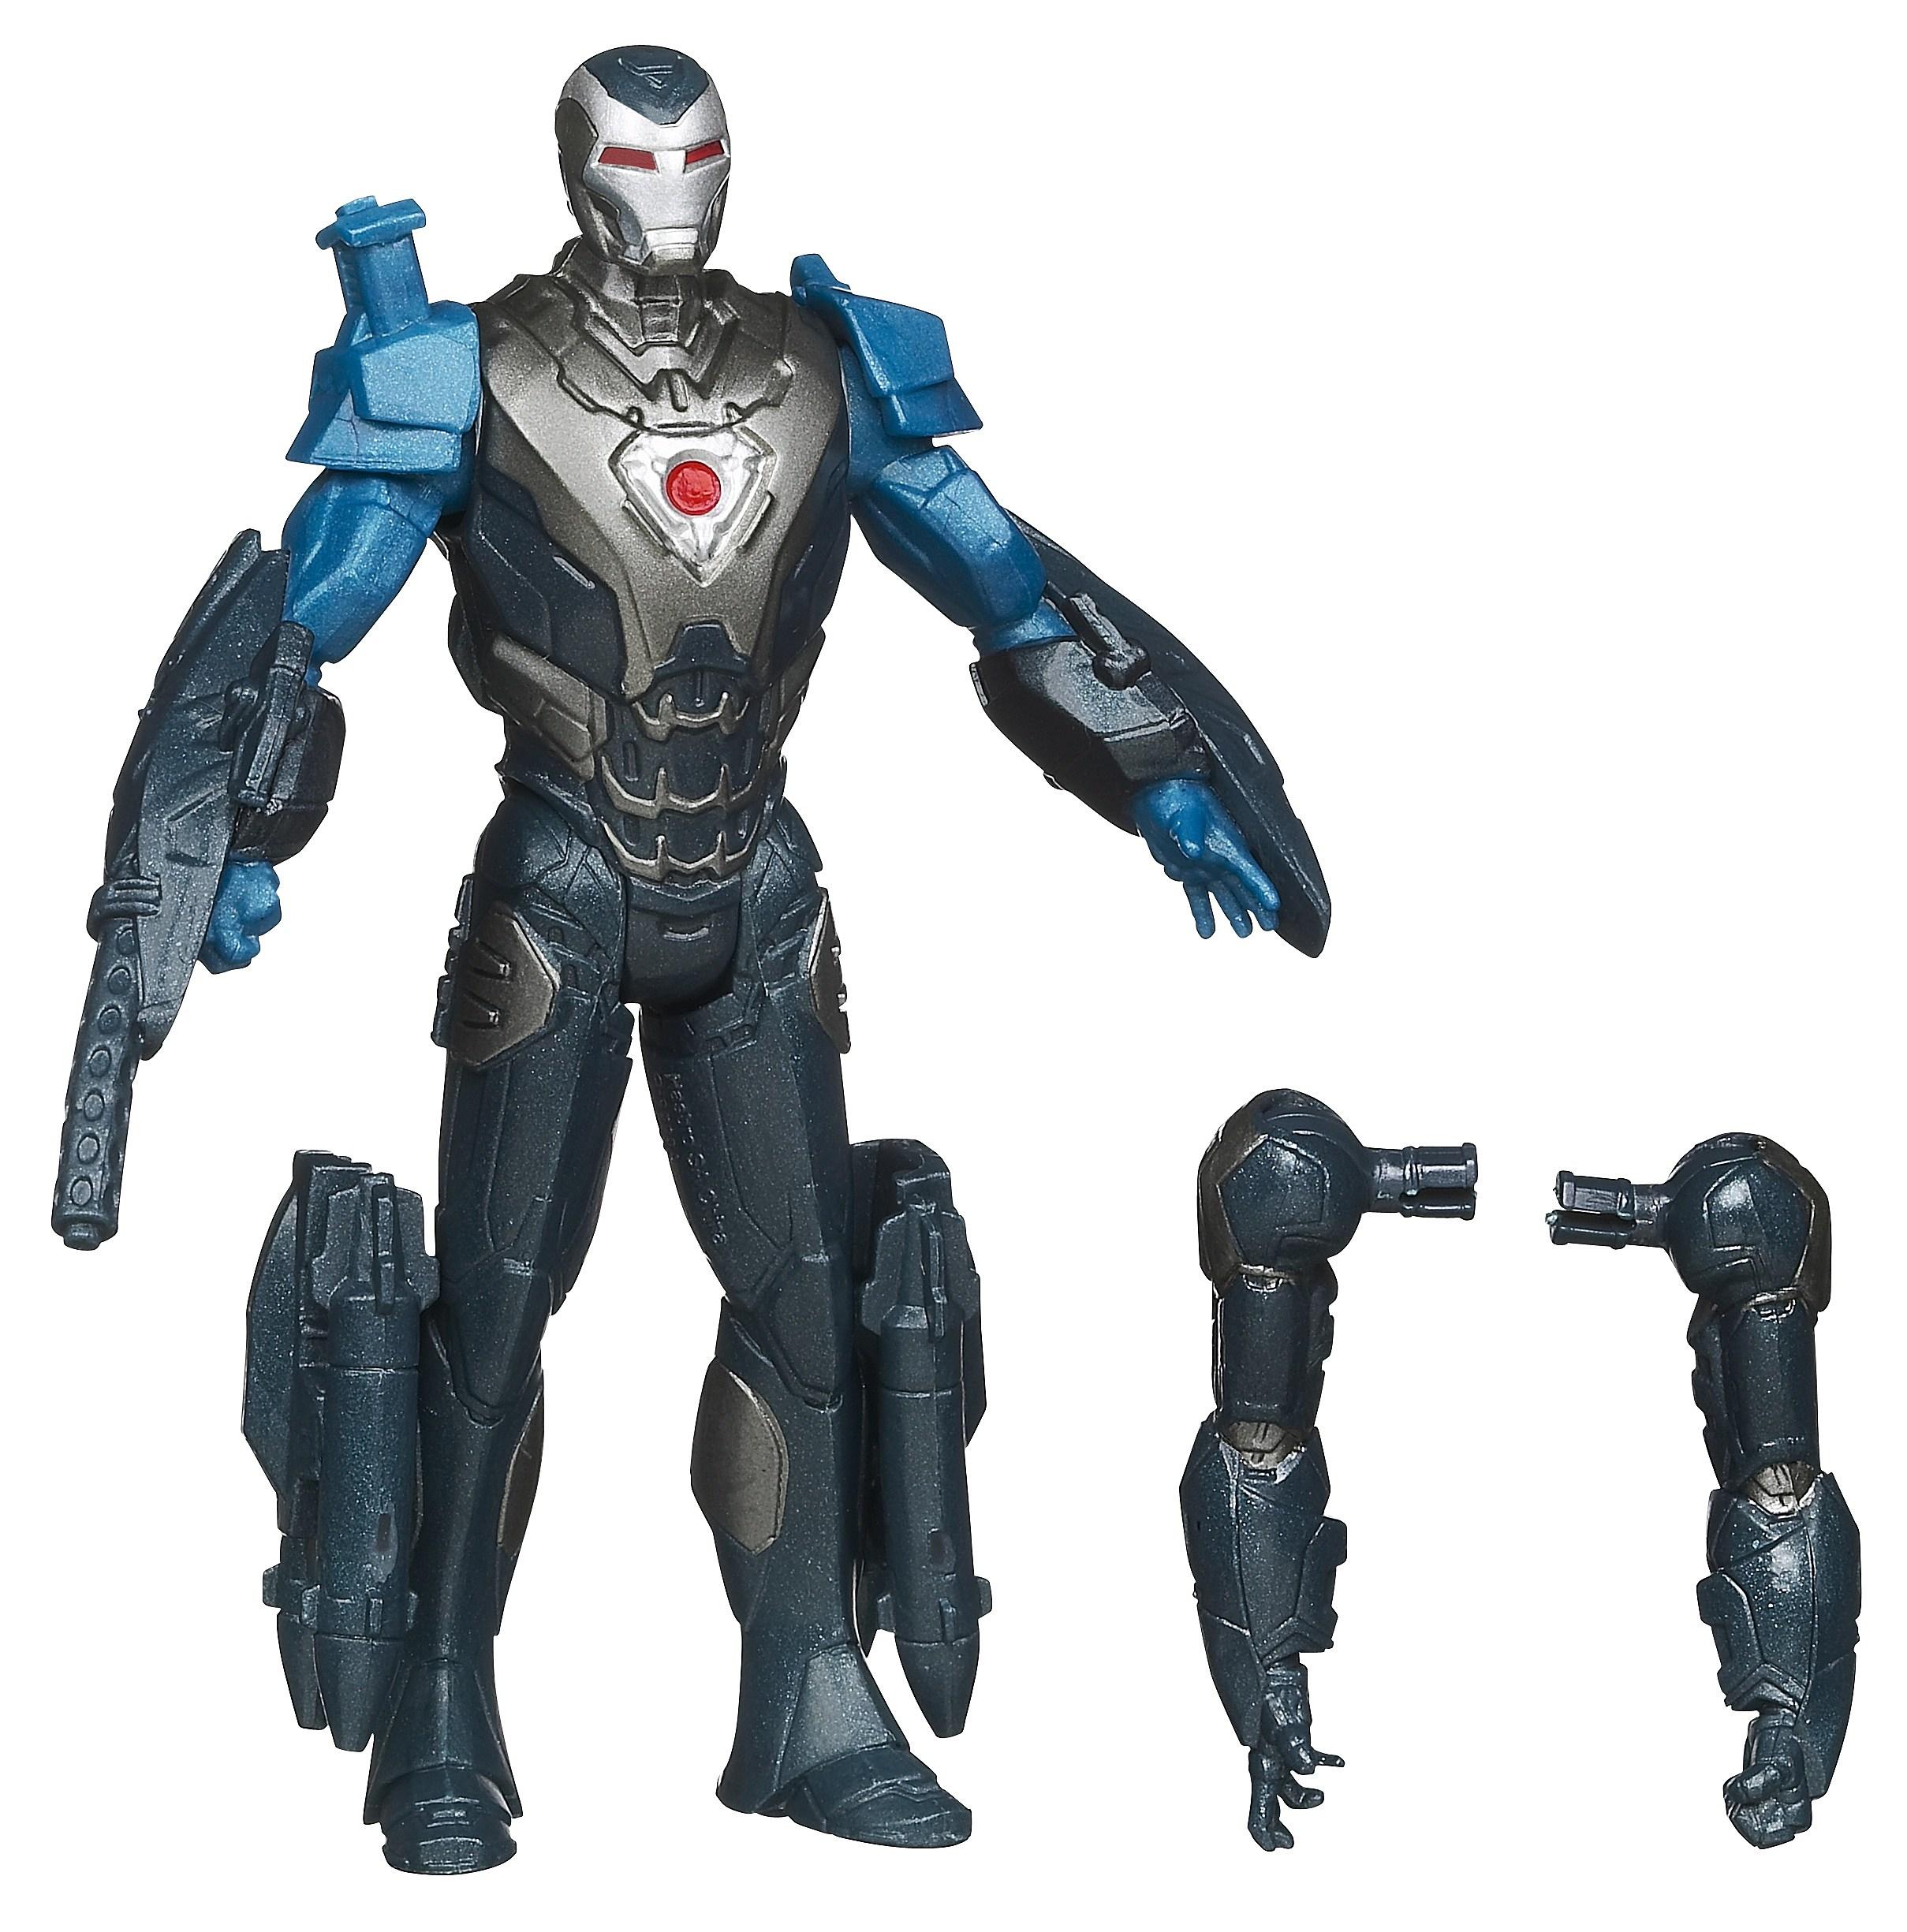 hasbro unveils new iron man 3 iron assemblers action figure images. Black Bedroom Furniture Sets. Home Design Ideas